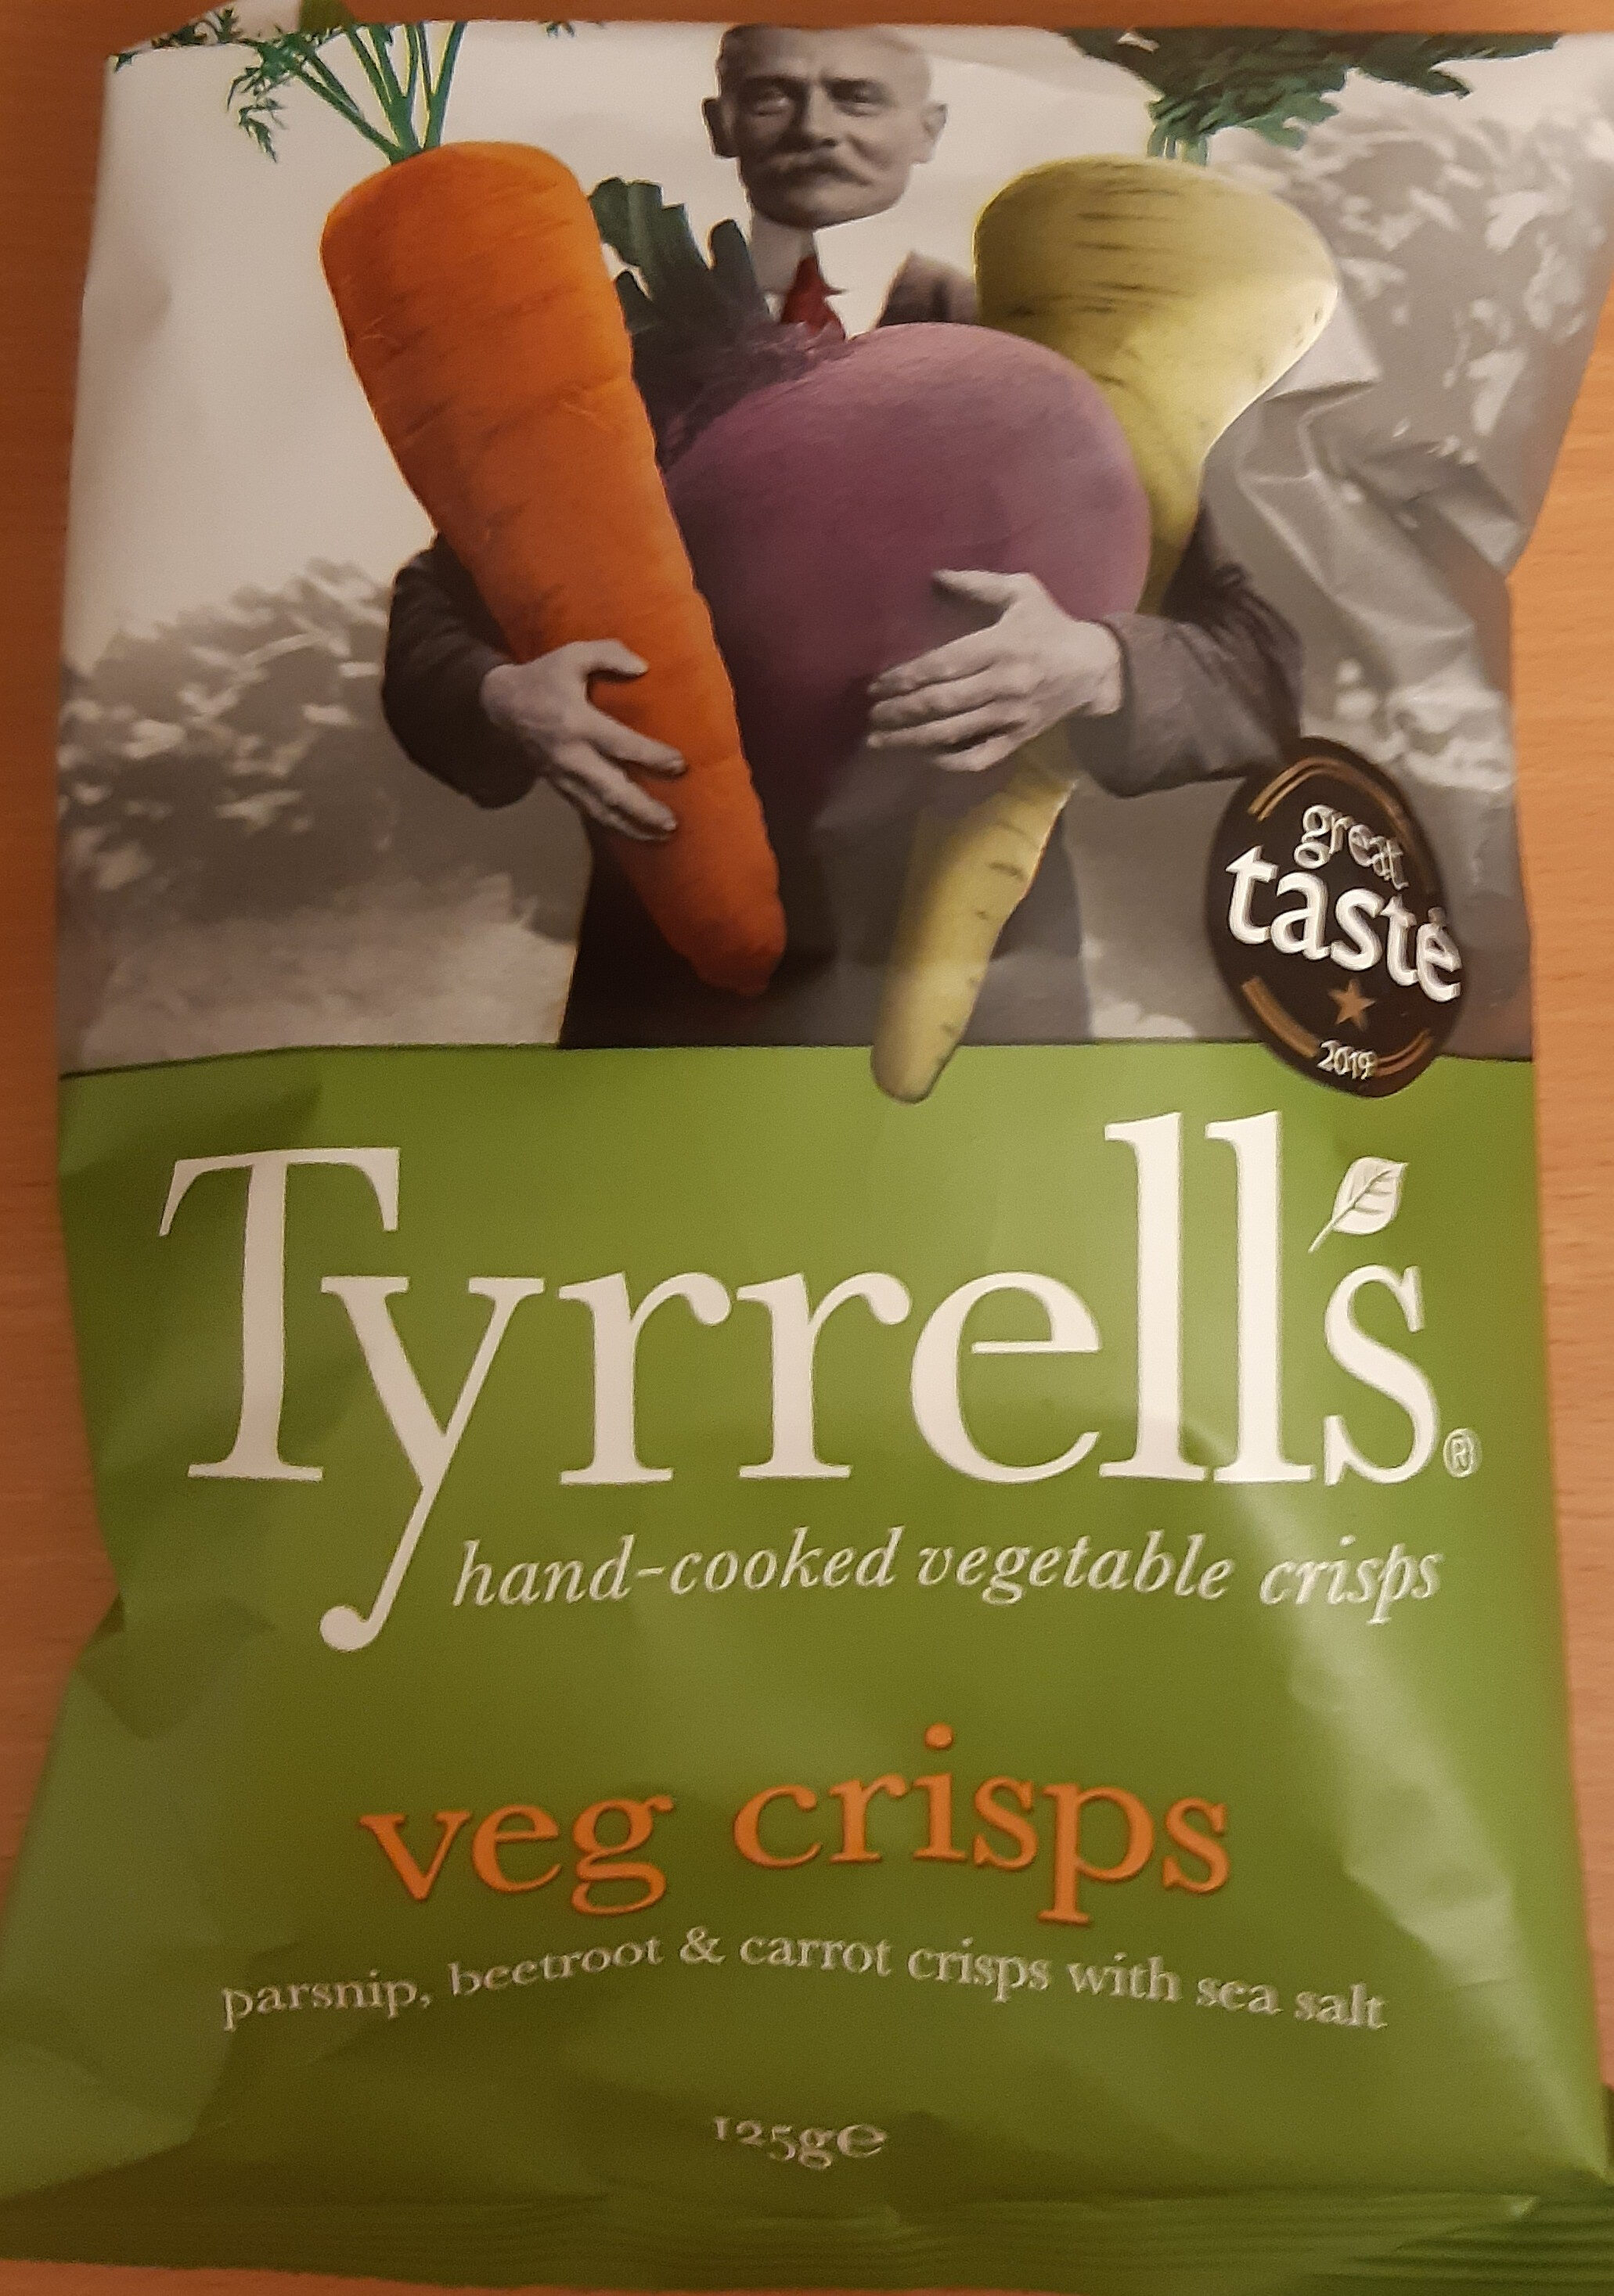 Hand-Cooked English Crisps Veg Crisps - Prodotto - it